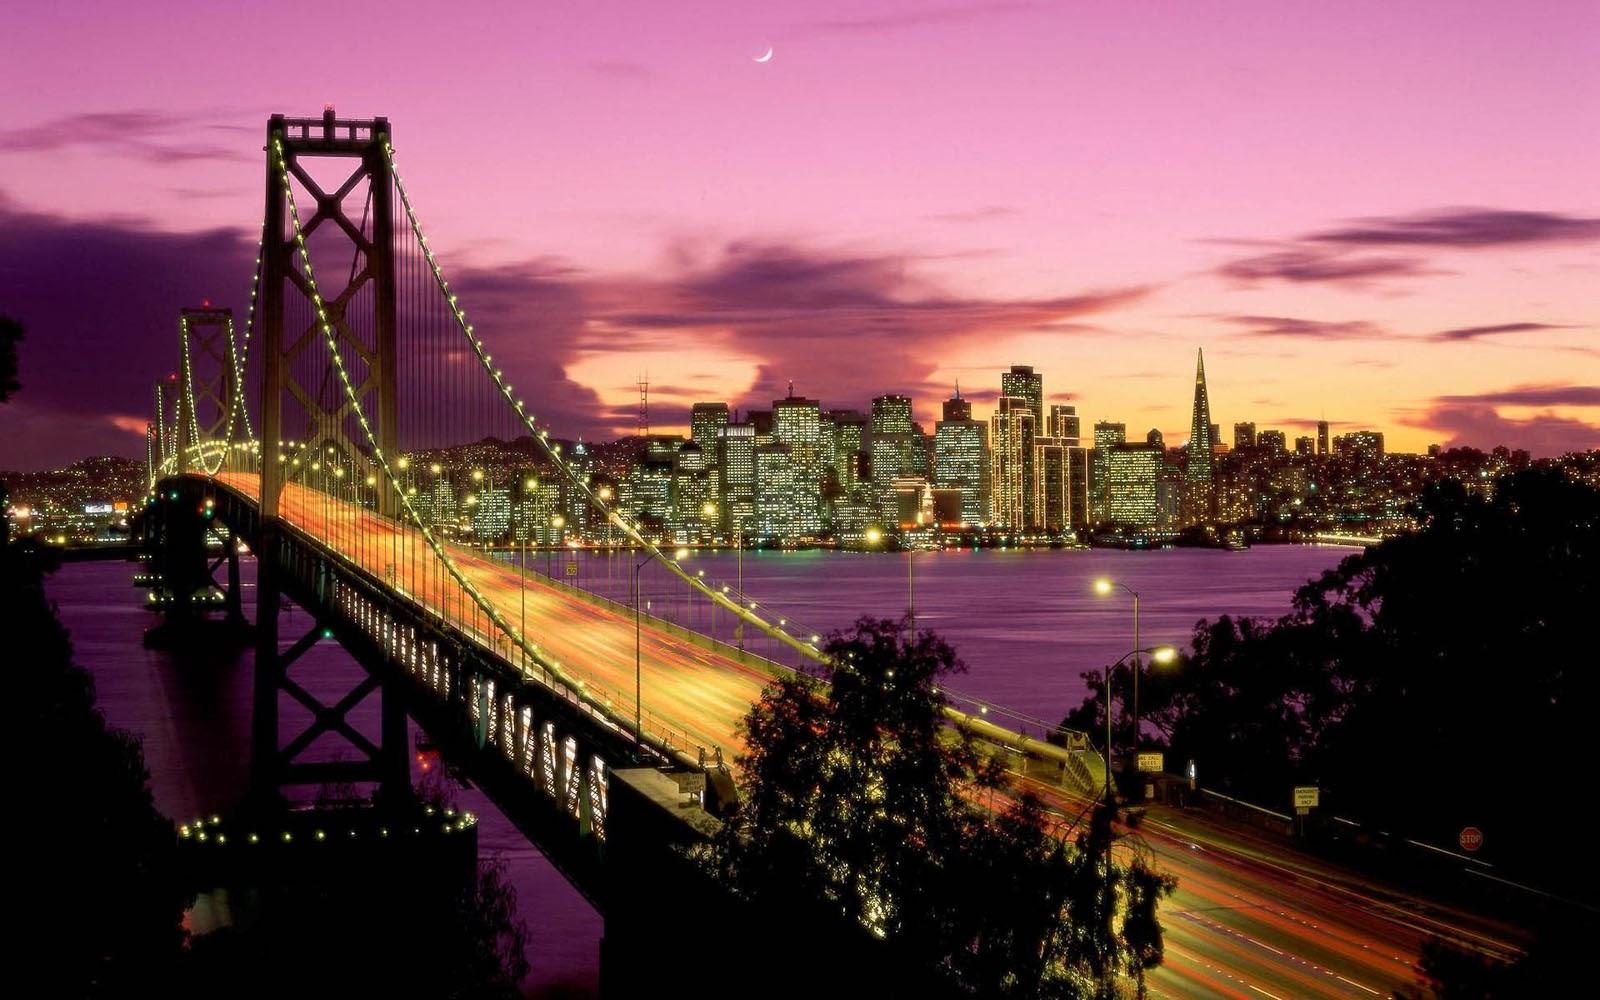 Wallpapers San Francisco Bay Bridge Wallpapers